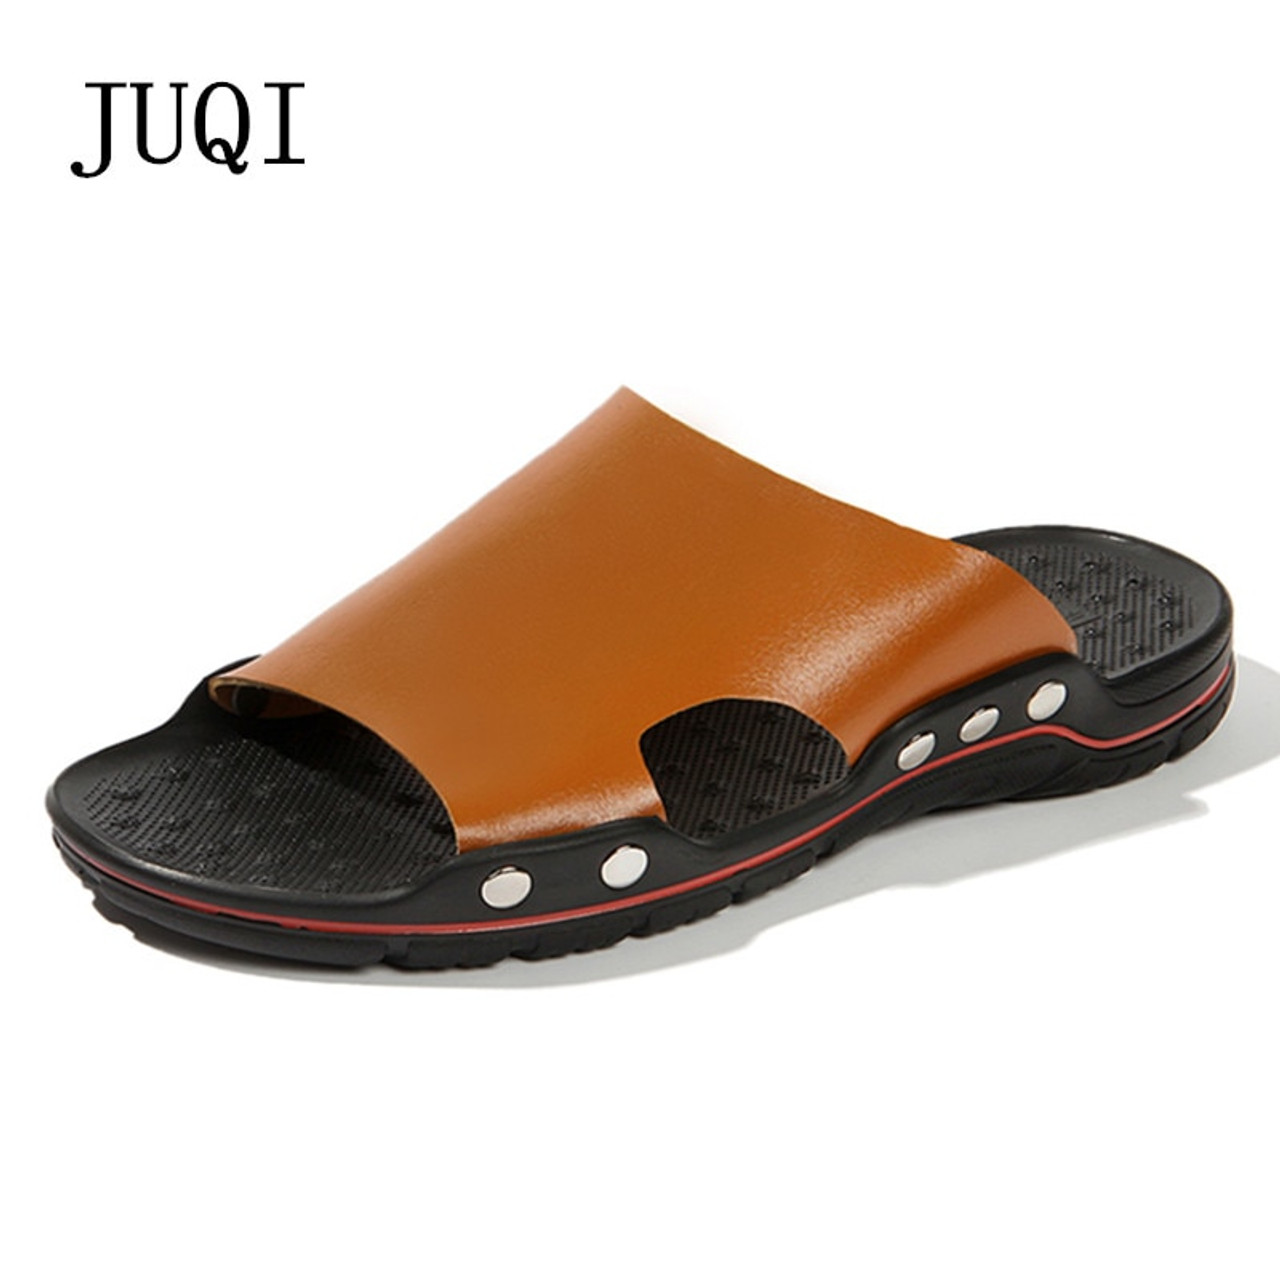 0bc0a45da890d5 2018 New Fashion Summer Shoes Men s Slippers PU Leather Beach Sandals Men  Casual Shoes Flip Flops ...